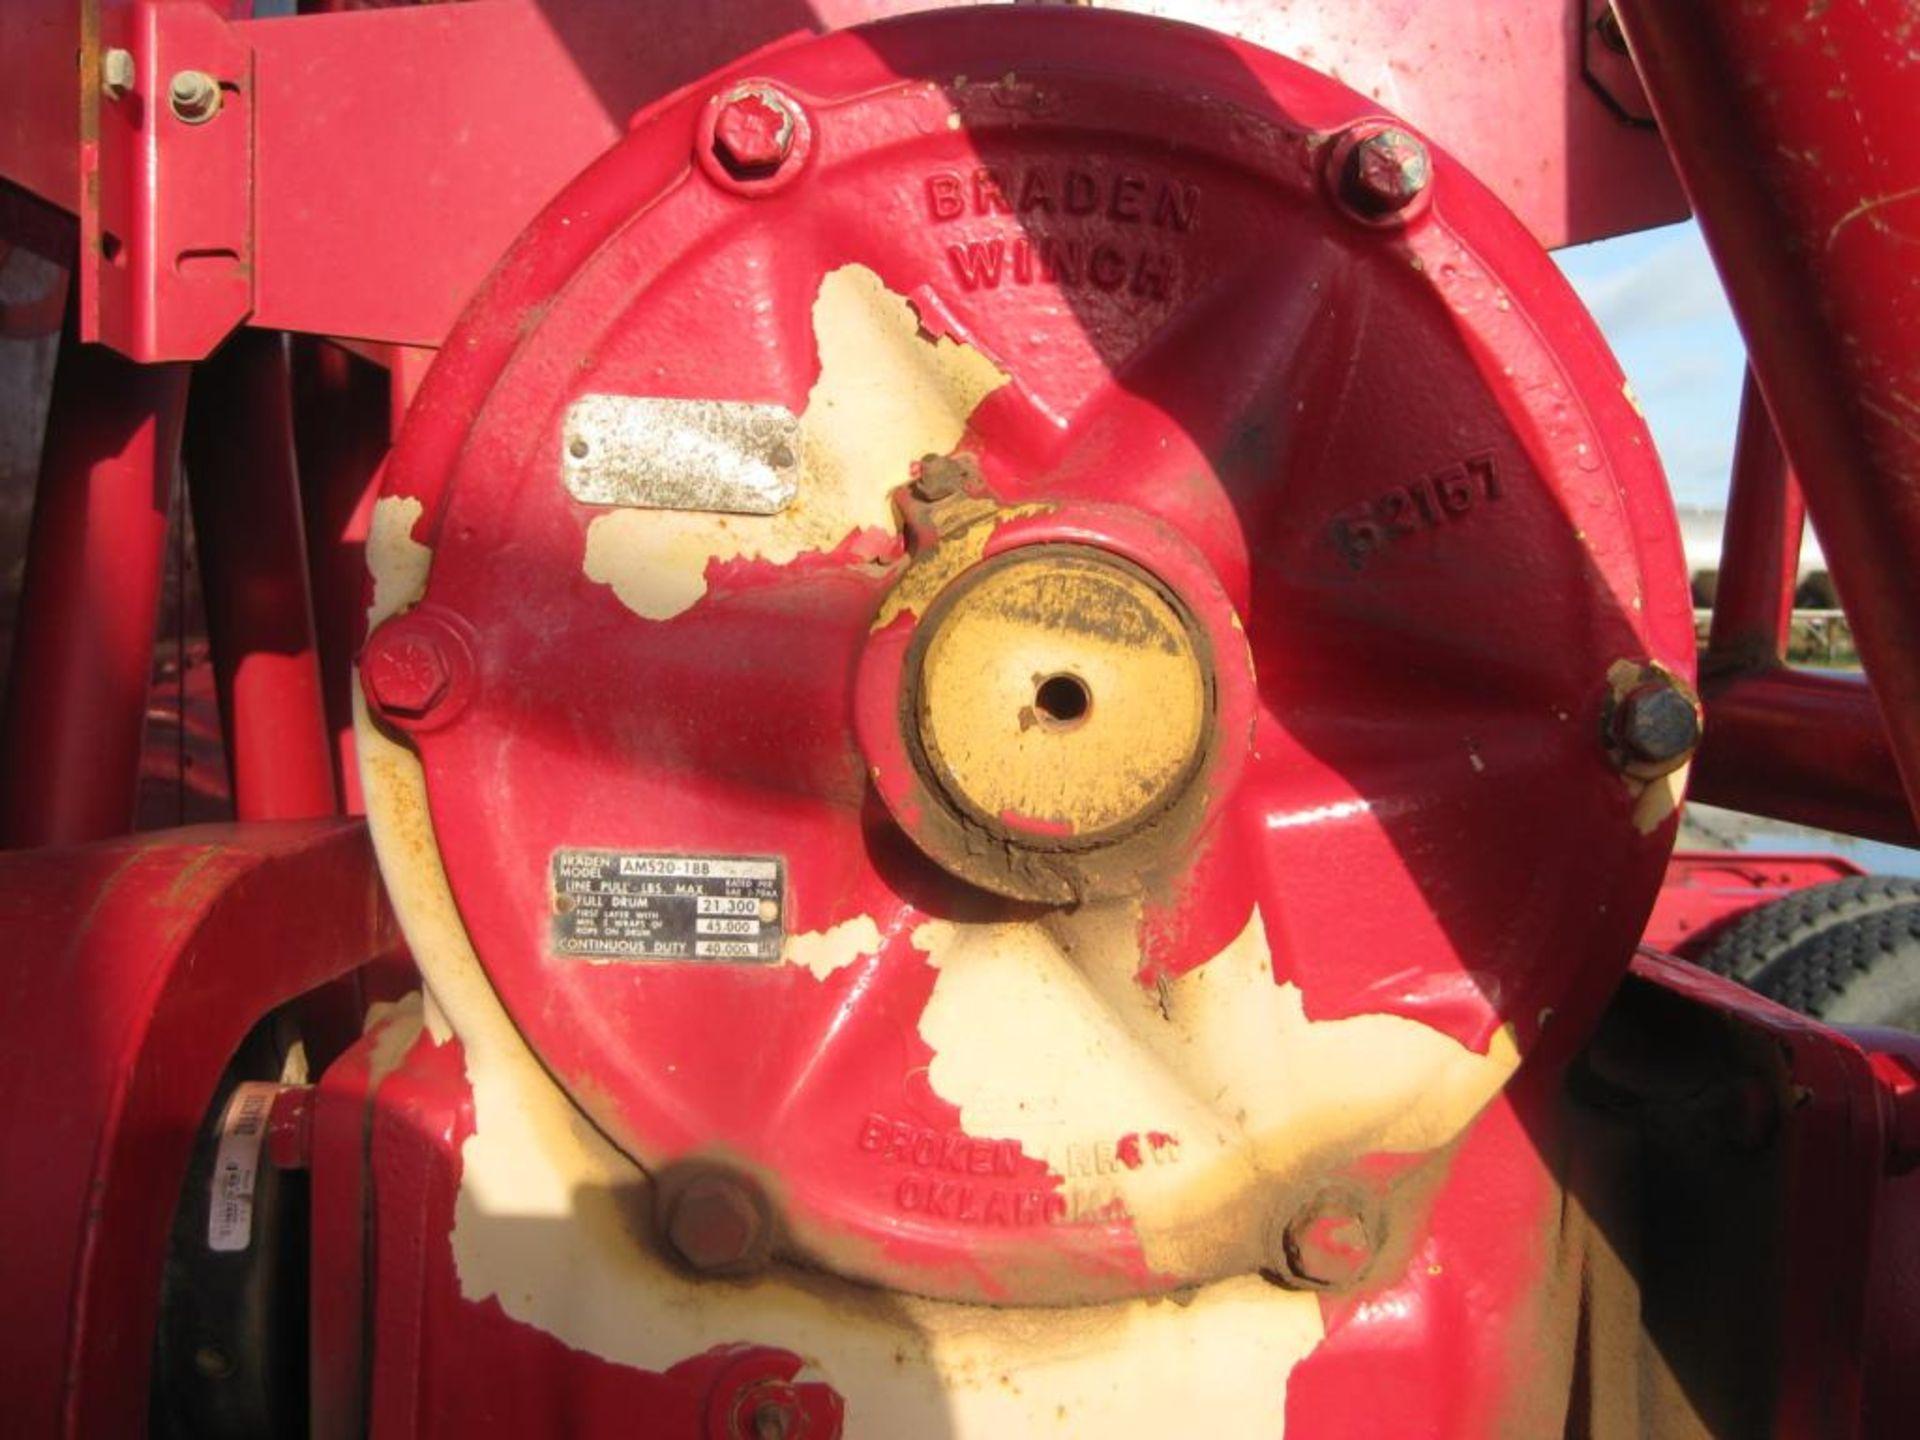 Kenworth Winch Truck - Image 11 of 22